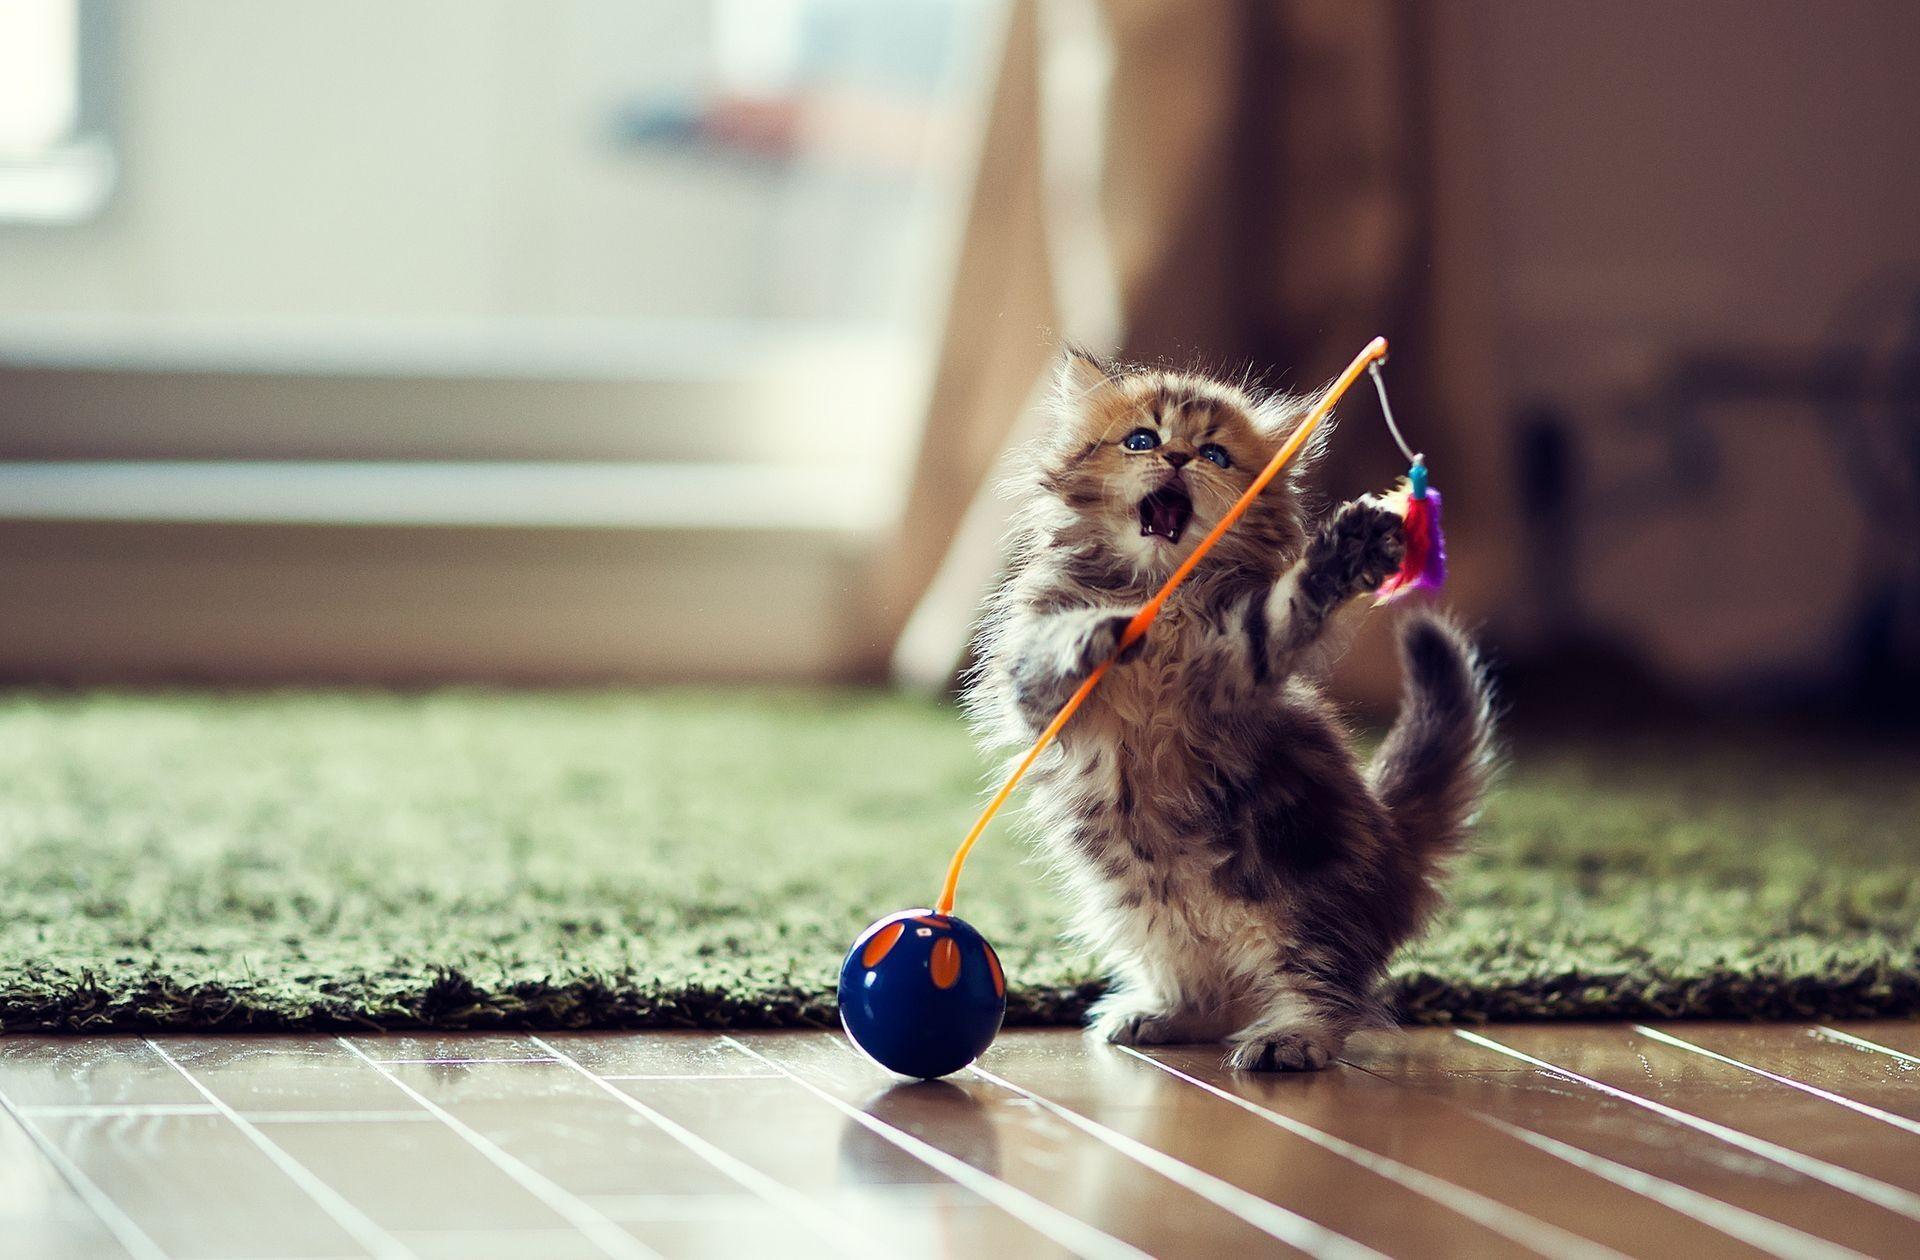 play-cat-wallpaper-1